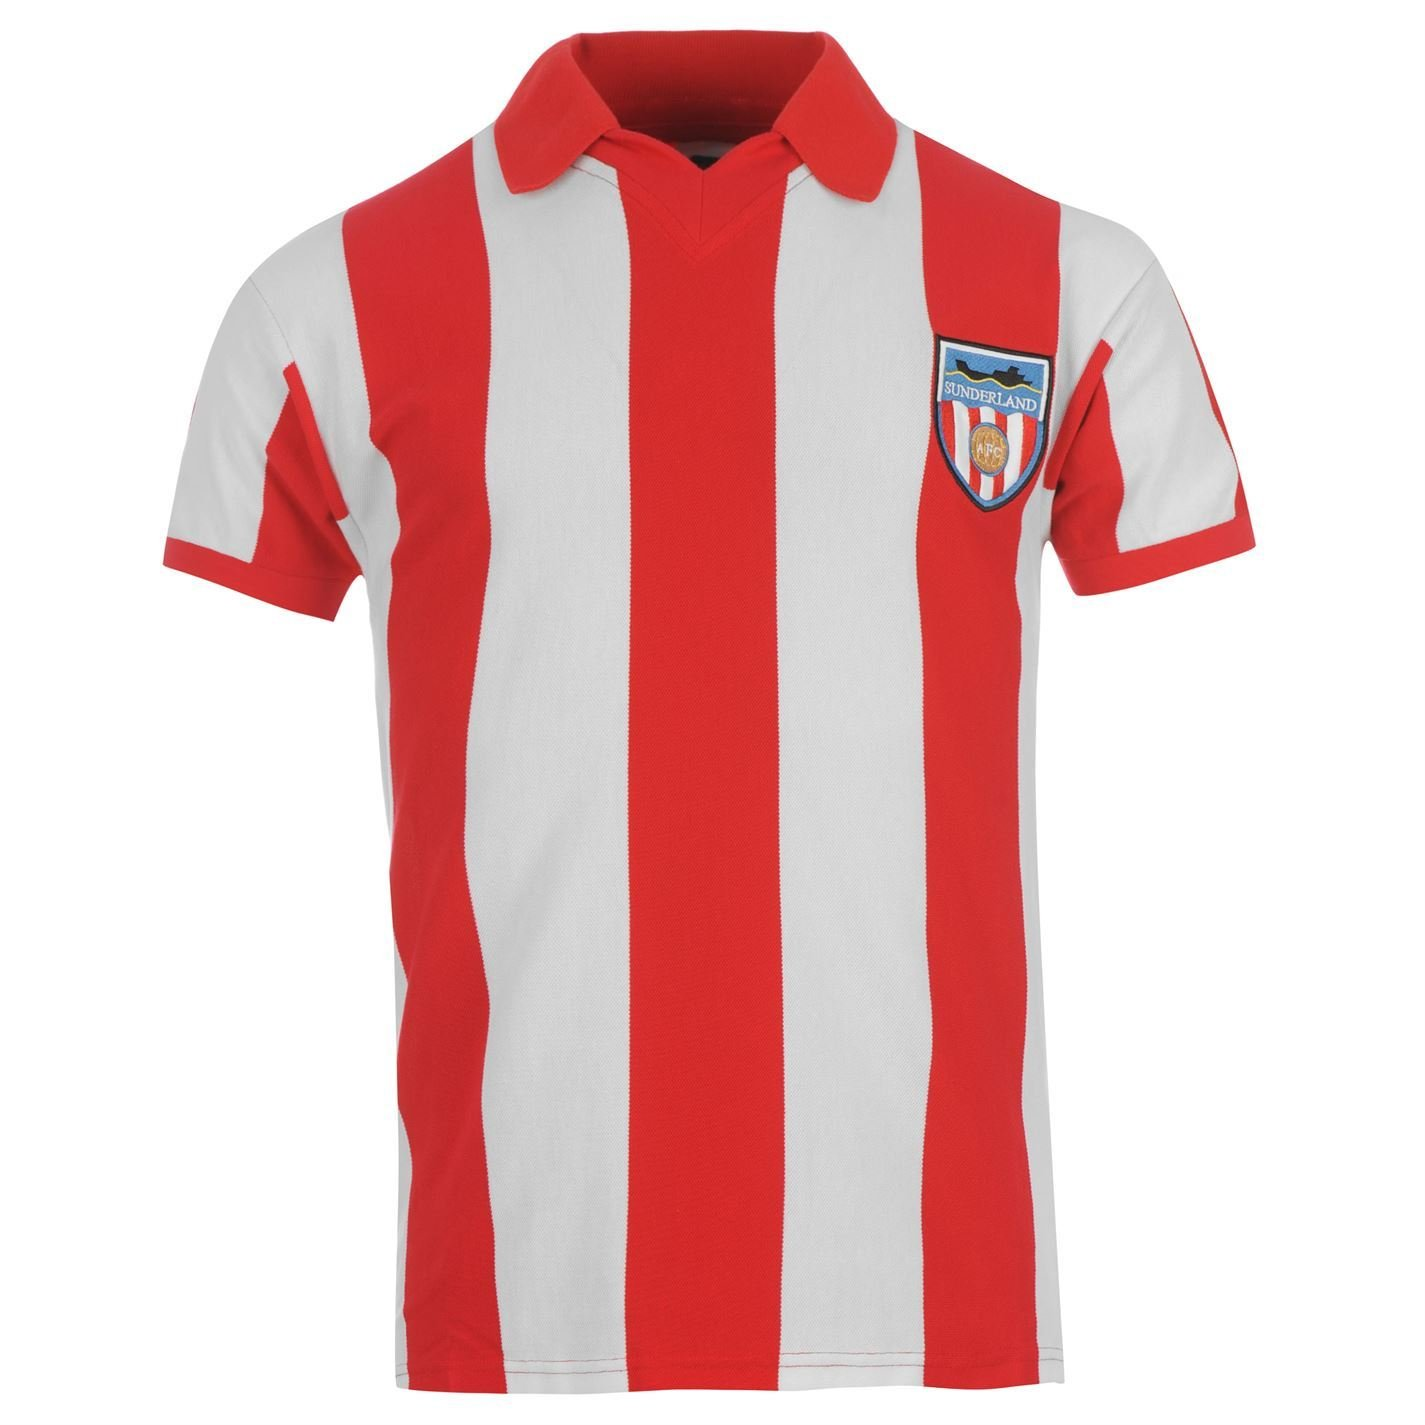 Sunderland AFC 1978 Home Jersey Score Draw Herren RD WHT Retro Football Fußball Top